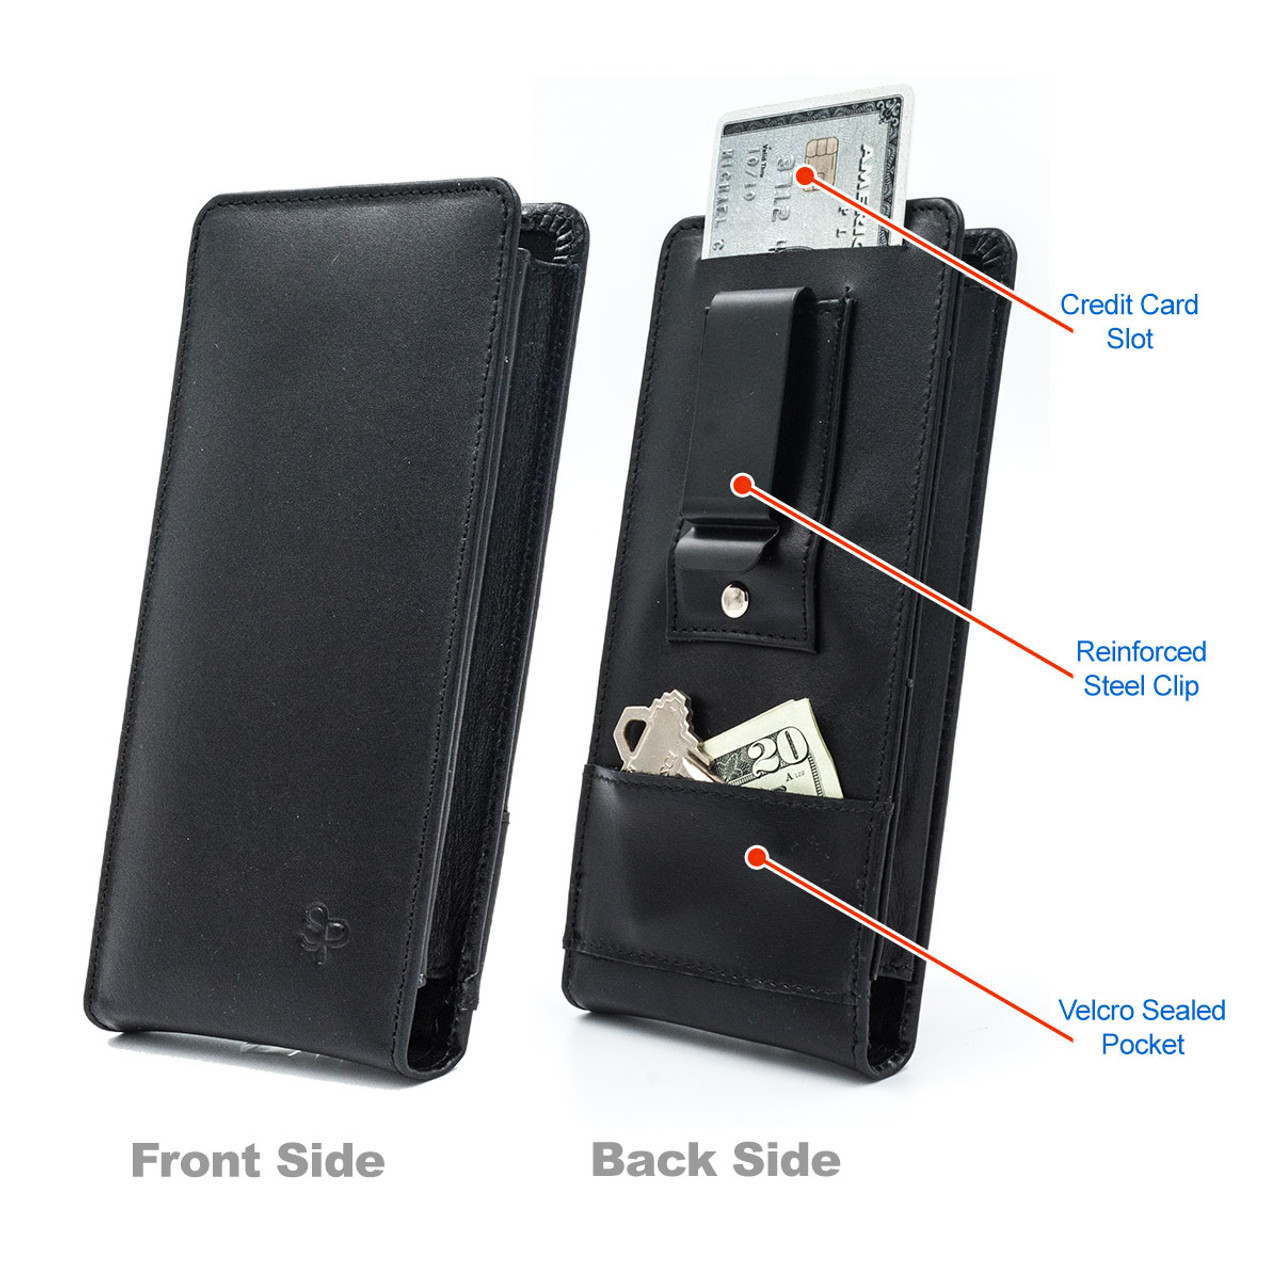 The Executive Cell Phone Case